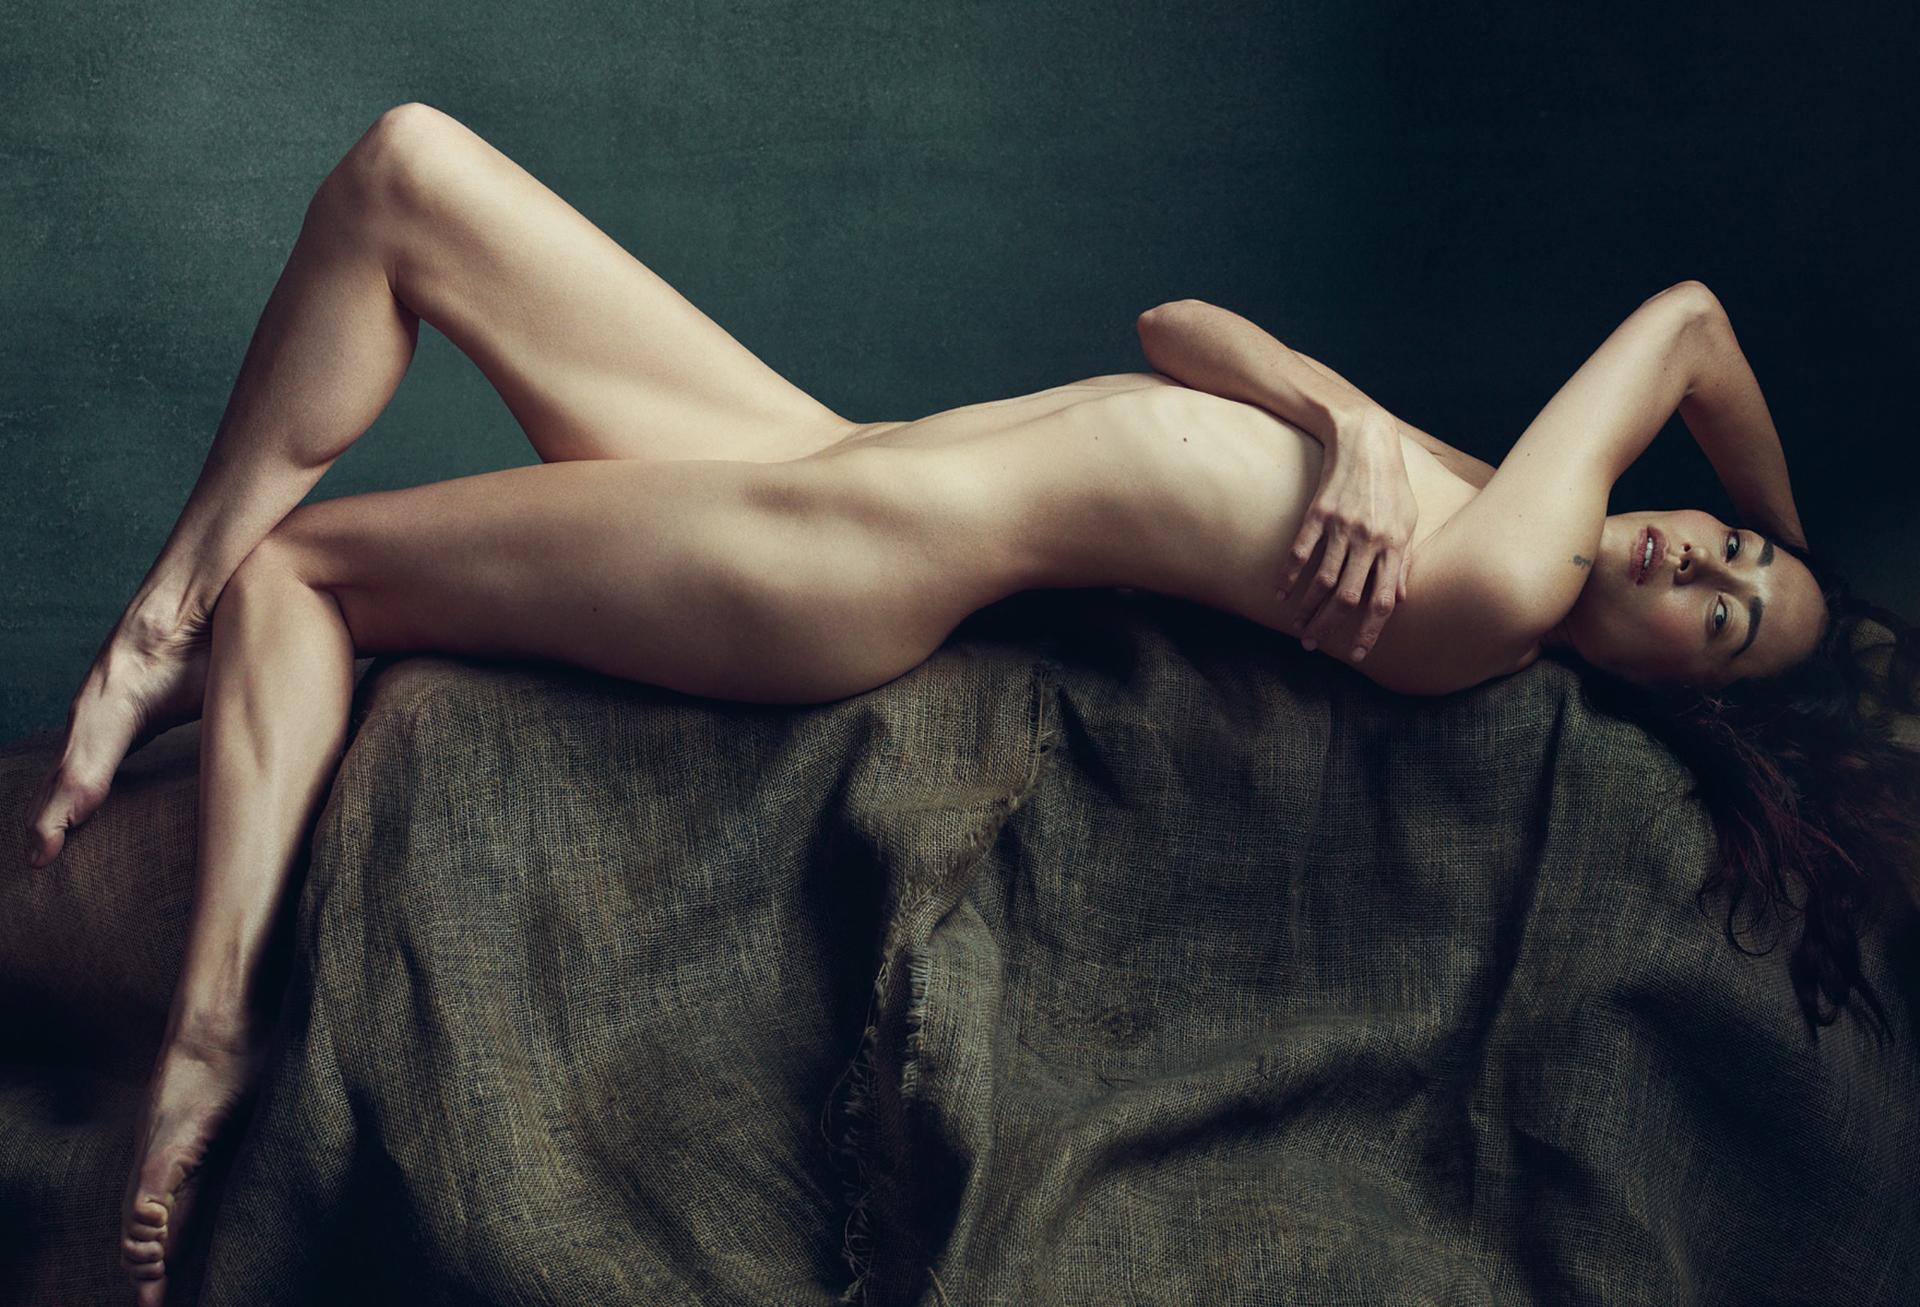 Mosshart naked